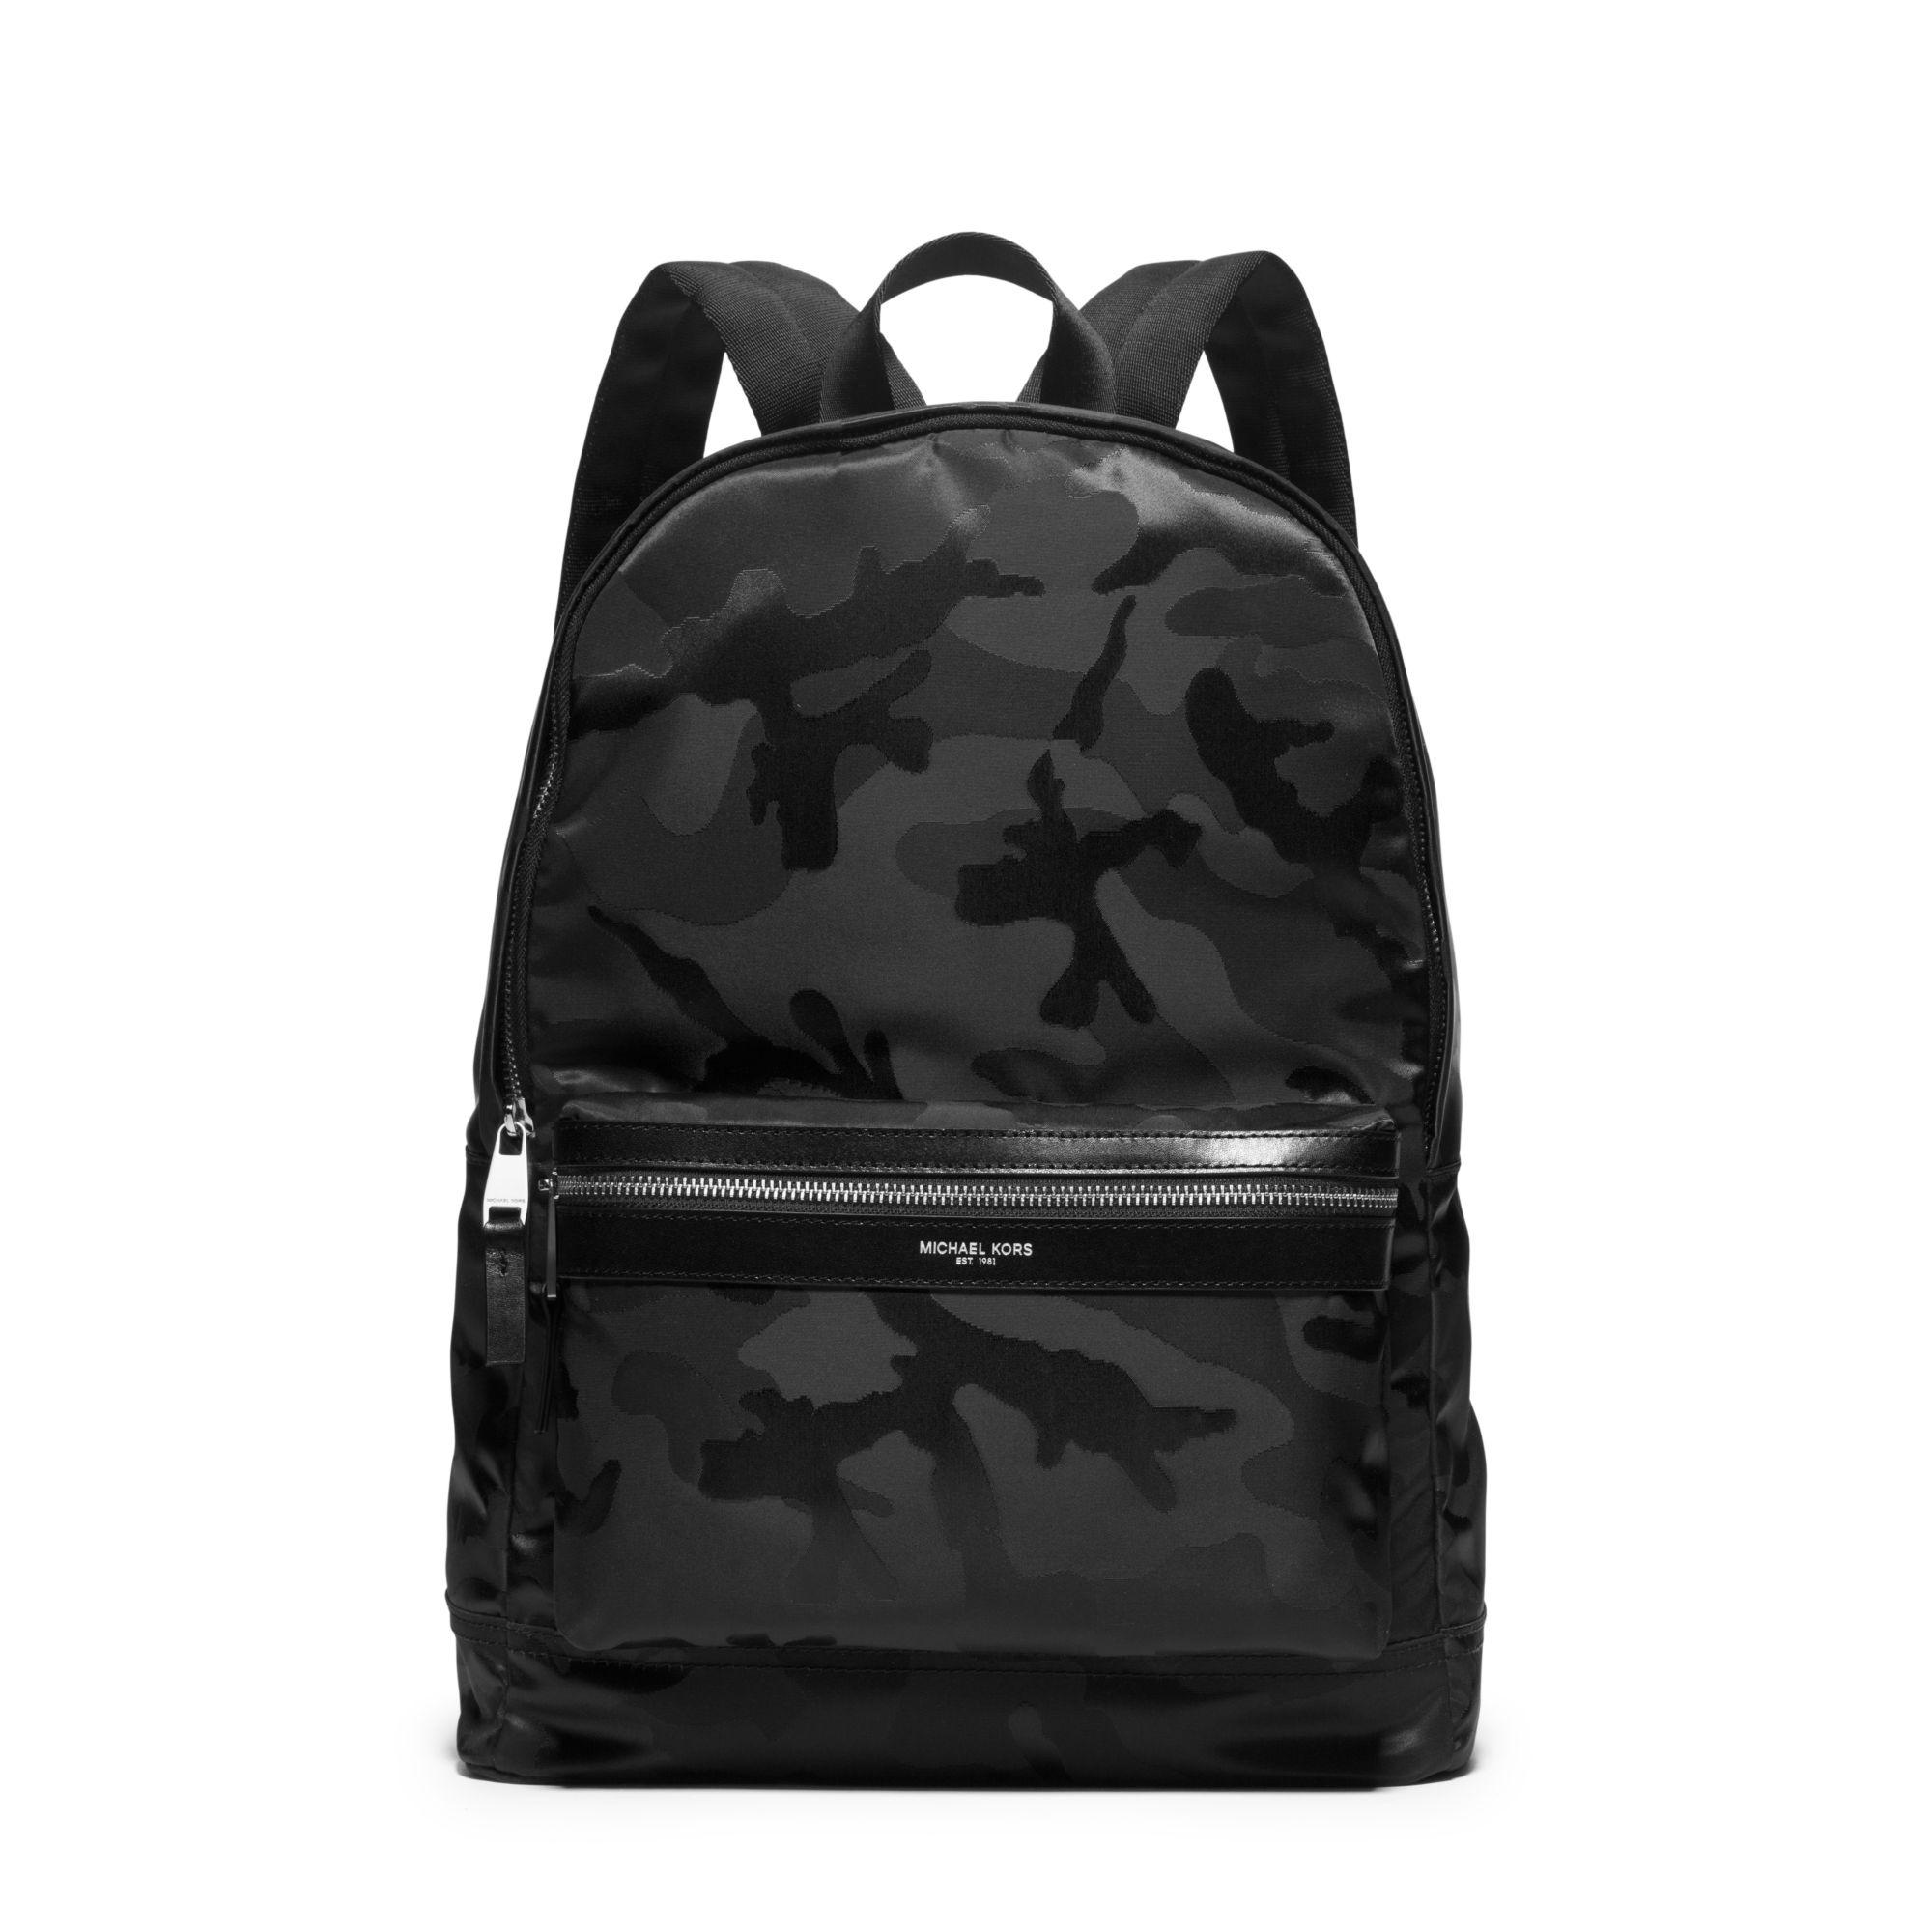 Michael Kors Kent Camouflage Nylon Jacquard Backpack In